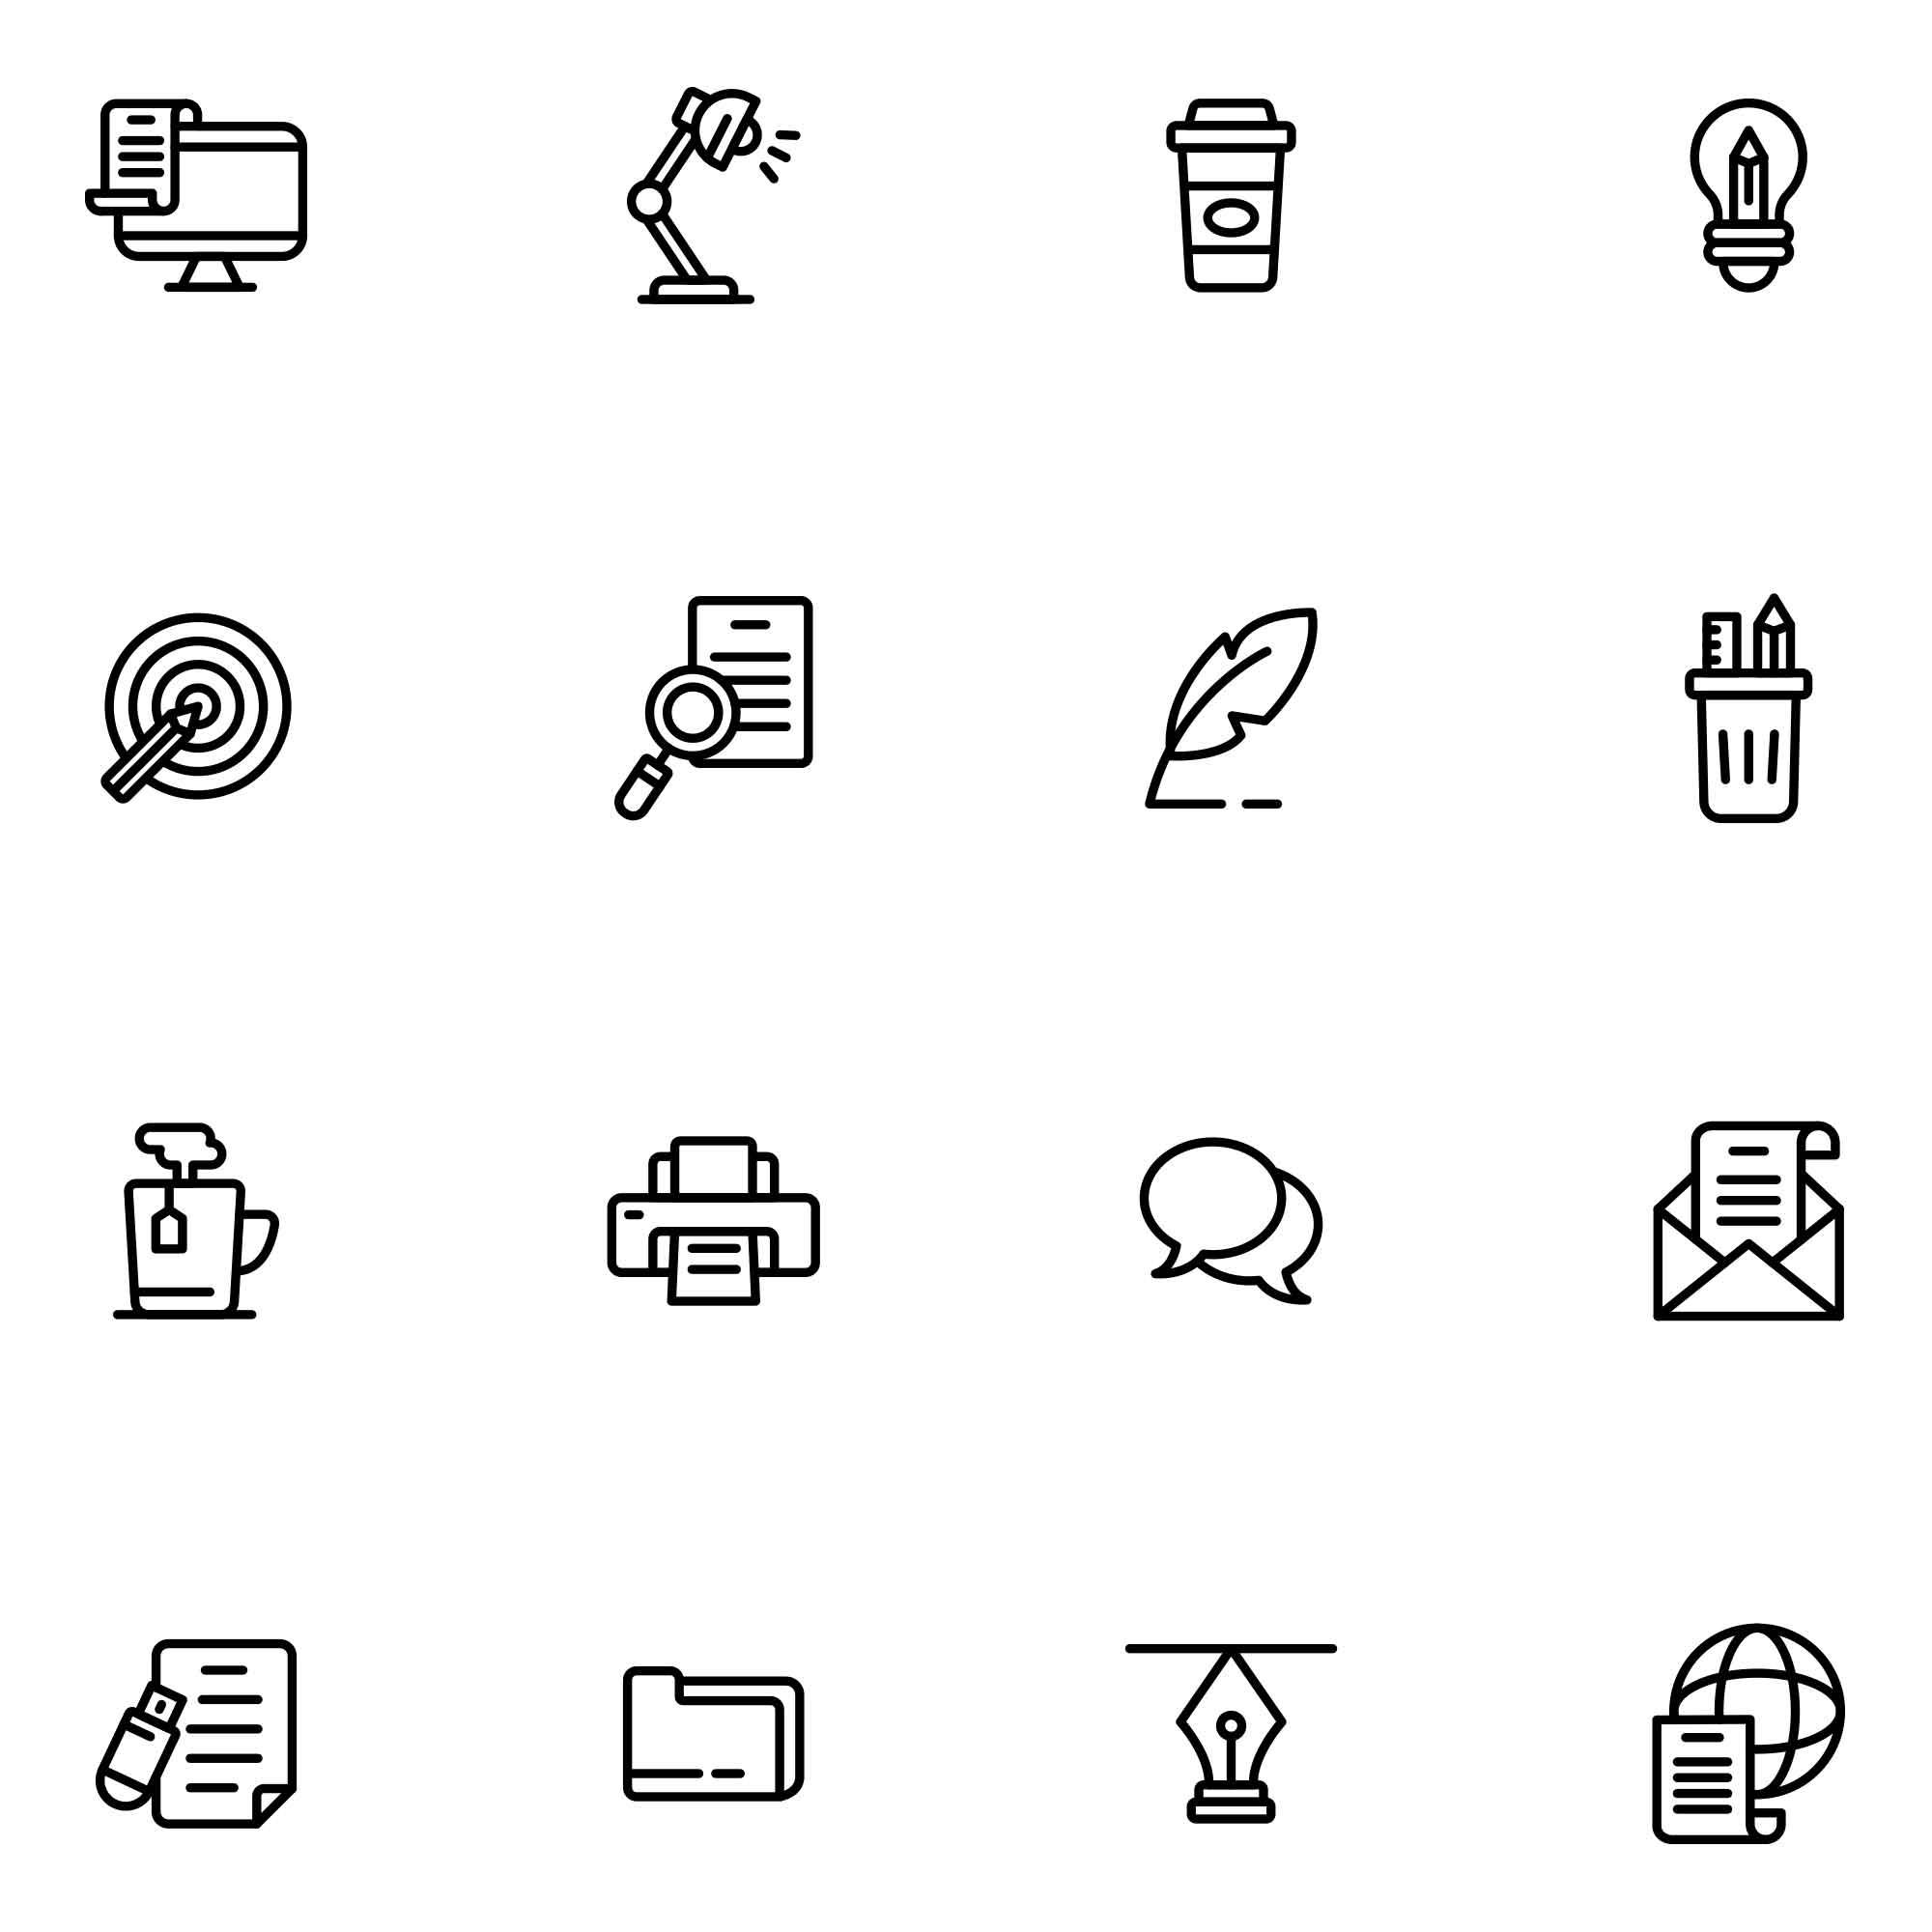 Copywriting Vector Icons